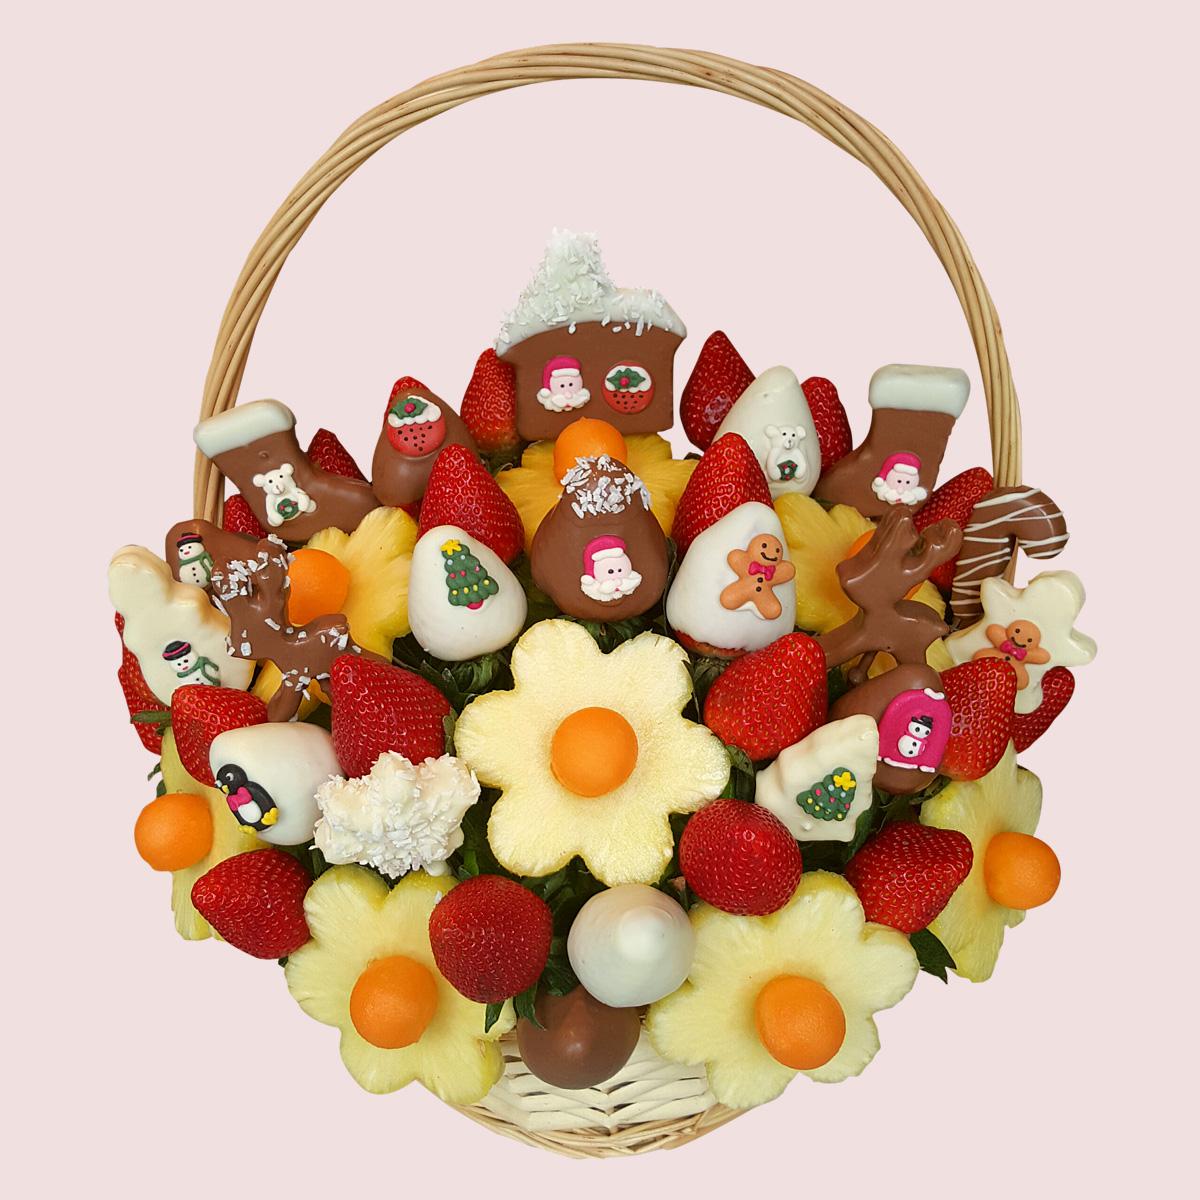 Gift Baskets Fruit Baskets Edible Bouquets Fruit Flowers